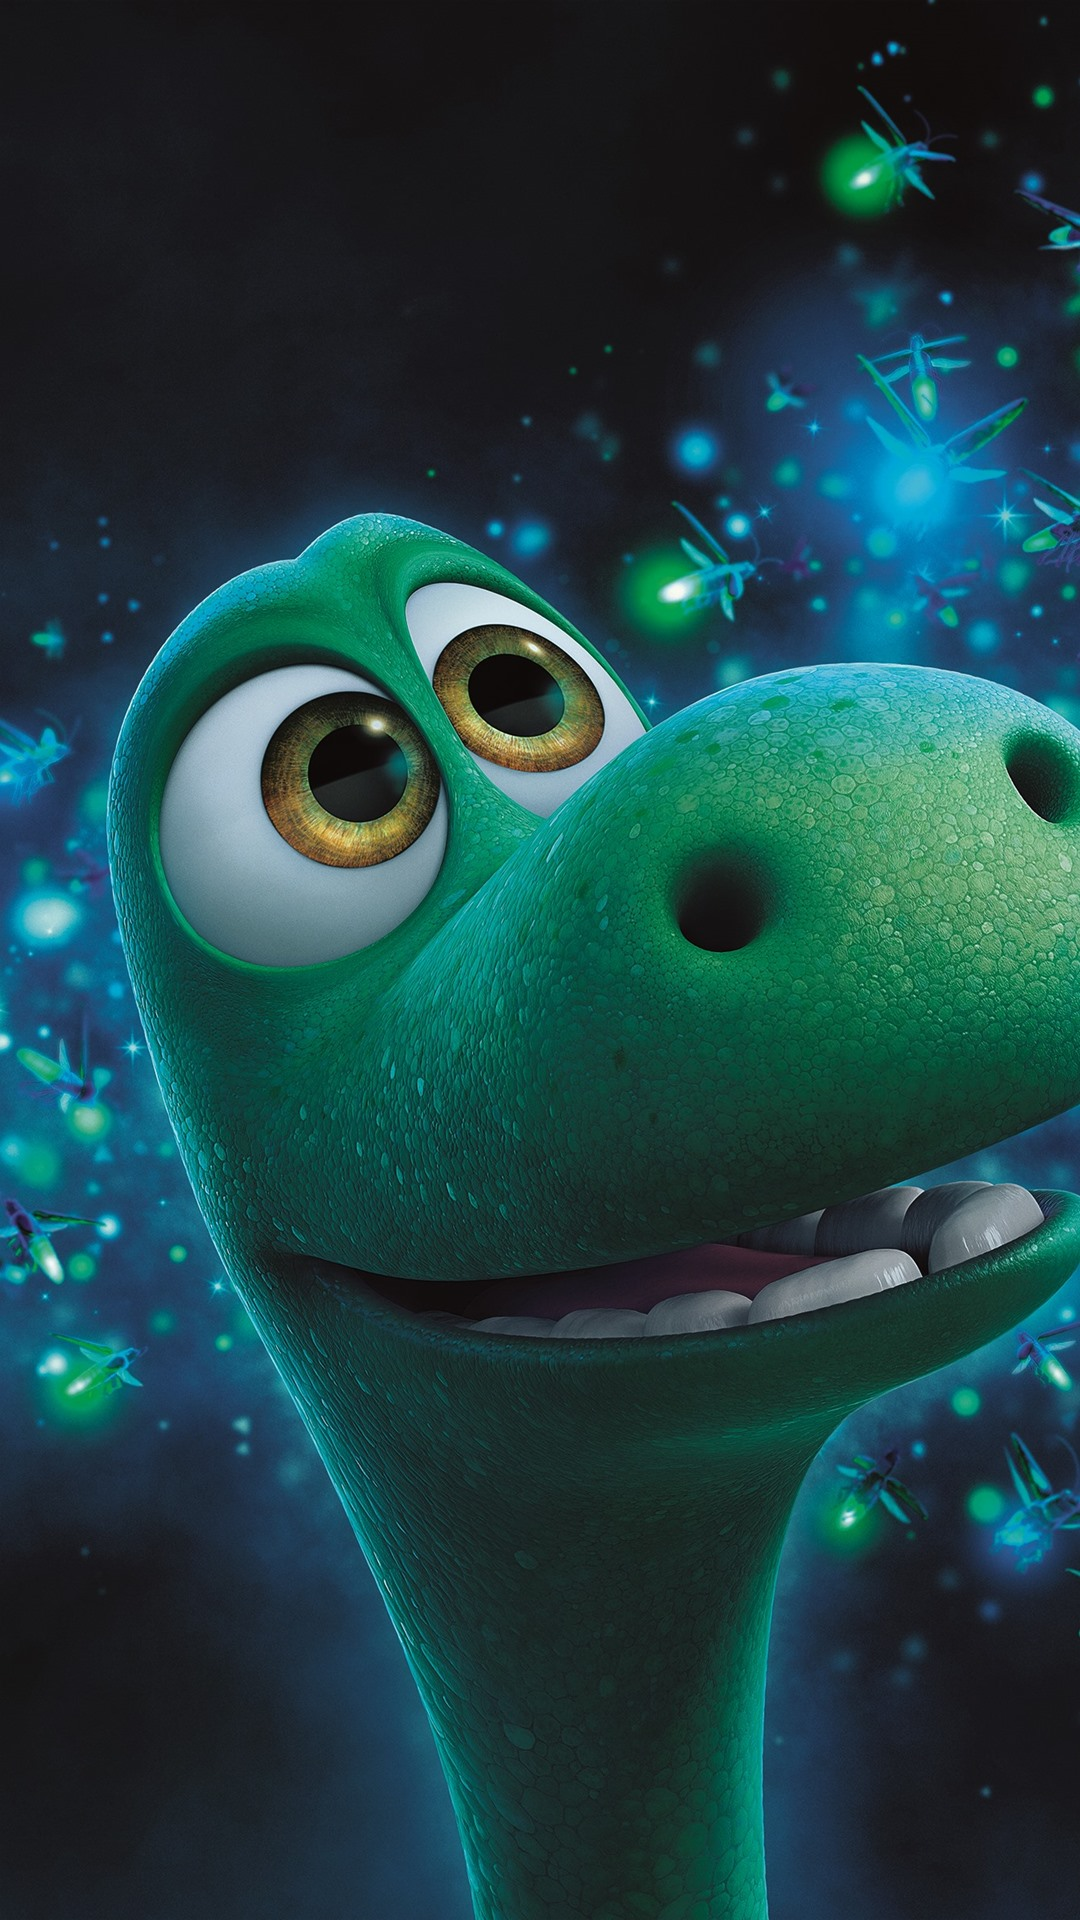 The Good Dinosaur 1080x1920 iPhone 8/7